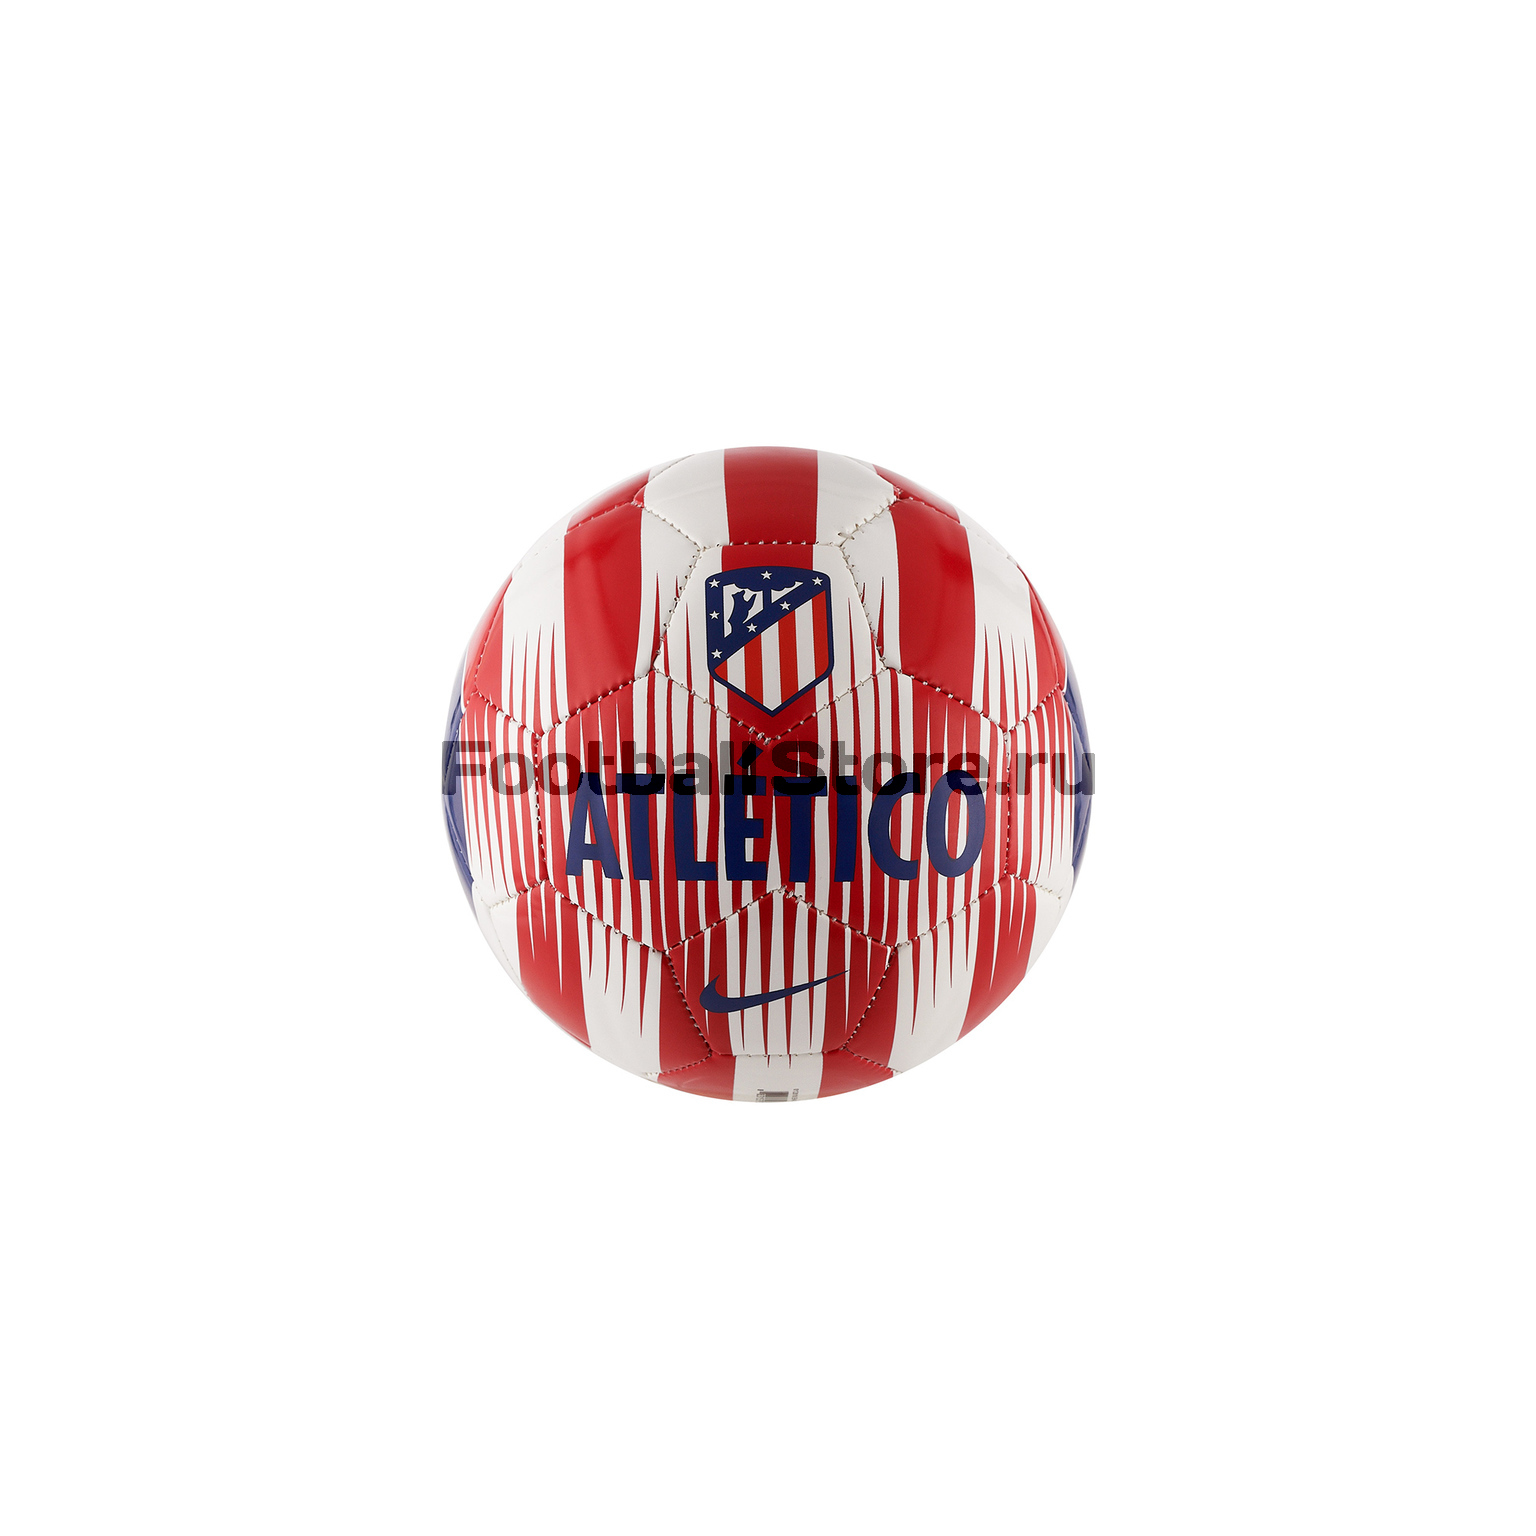 Мяч сувенирный Atletico Madrid 2018/19 цена